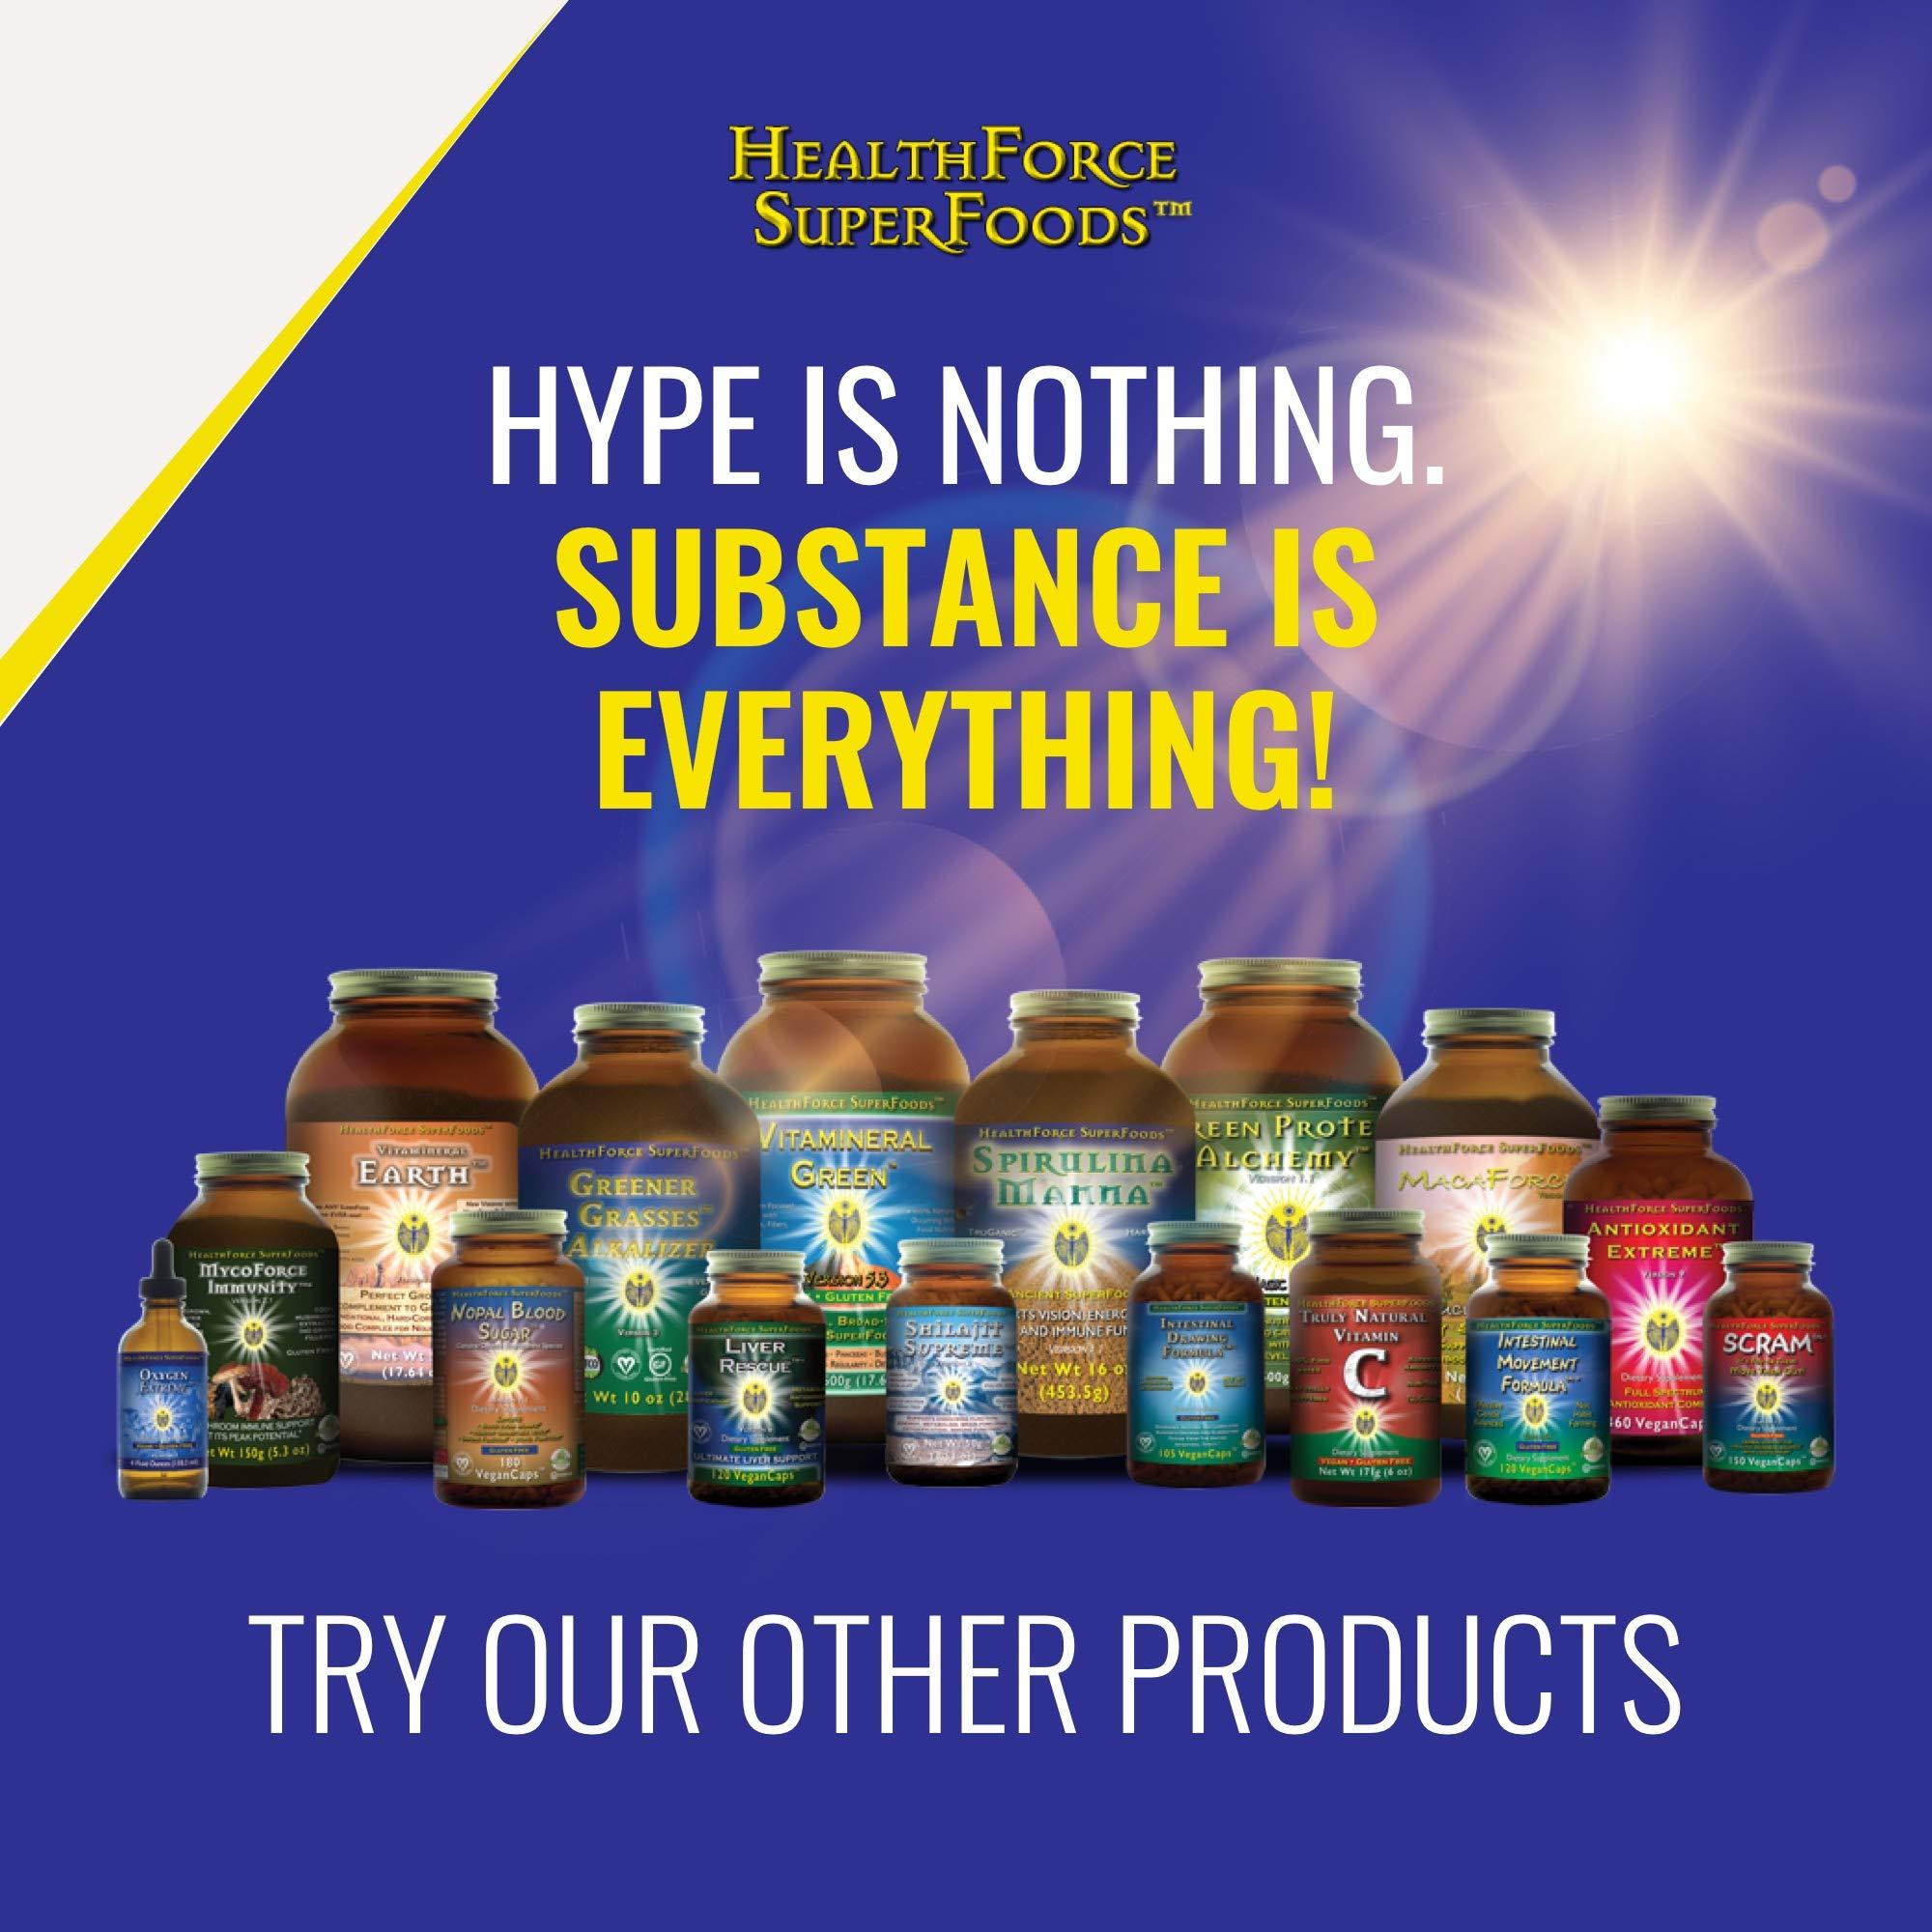 HealthForce SuperFoods Intestinal Movement Formula, Herbal Laxative, All-Natural, Organic, Non-GMO, Gluten-Free, Kosher, Vegan, 120 Count by HEALTHFORCE SUPERFOODS (Image #9)